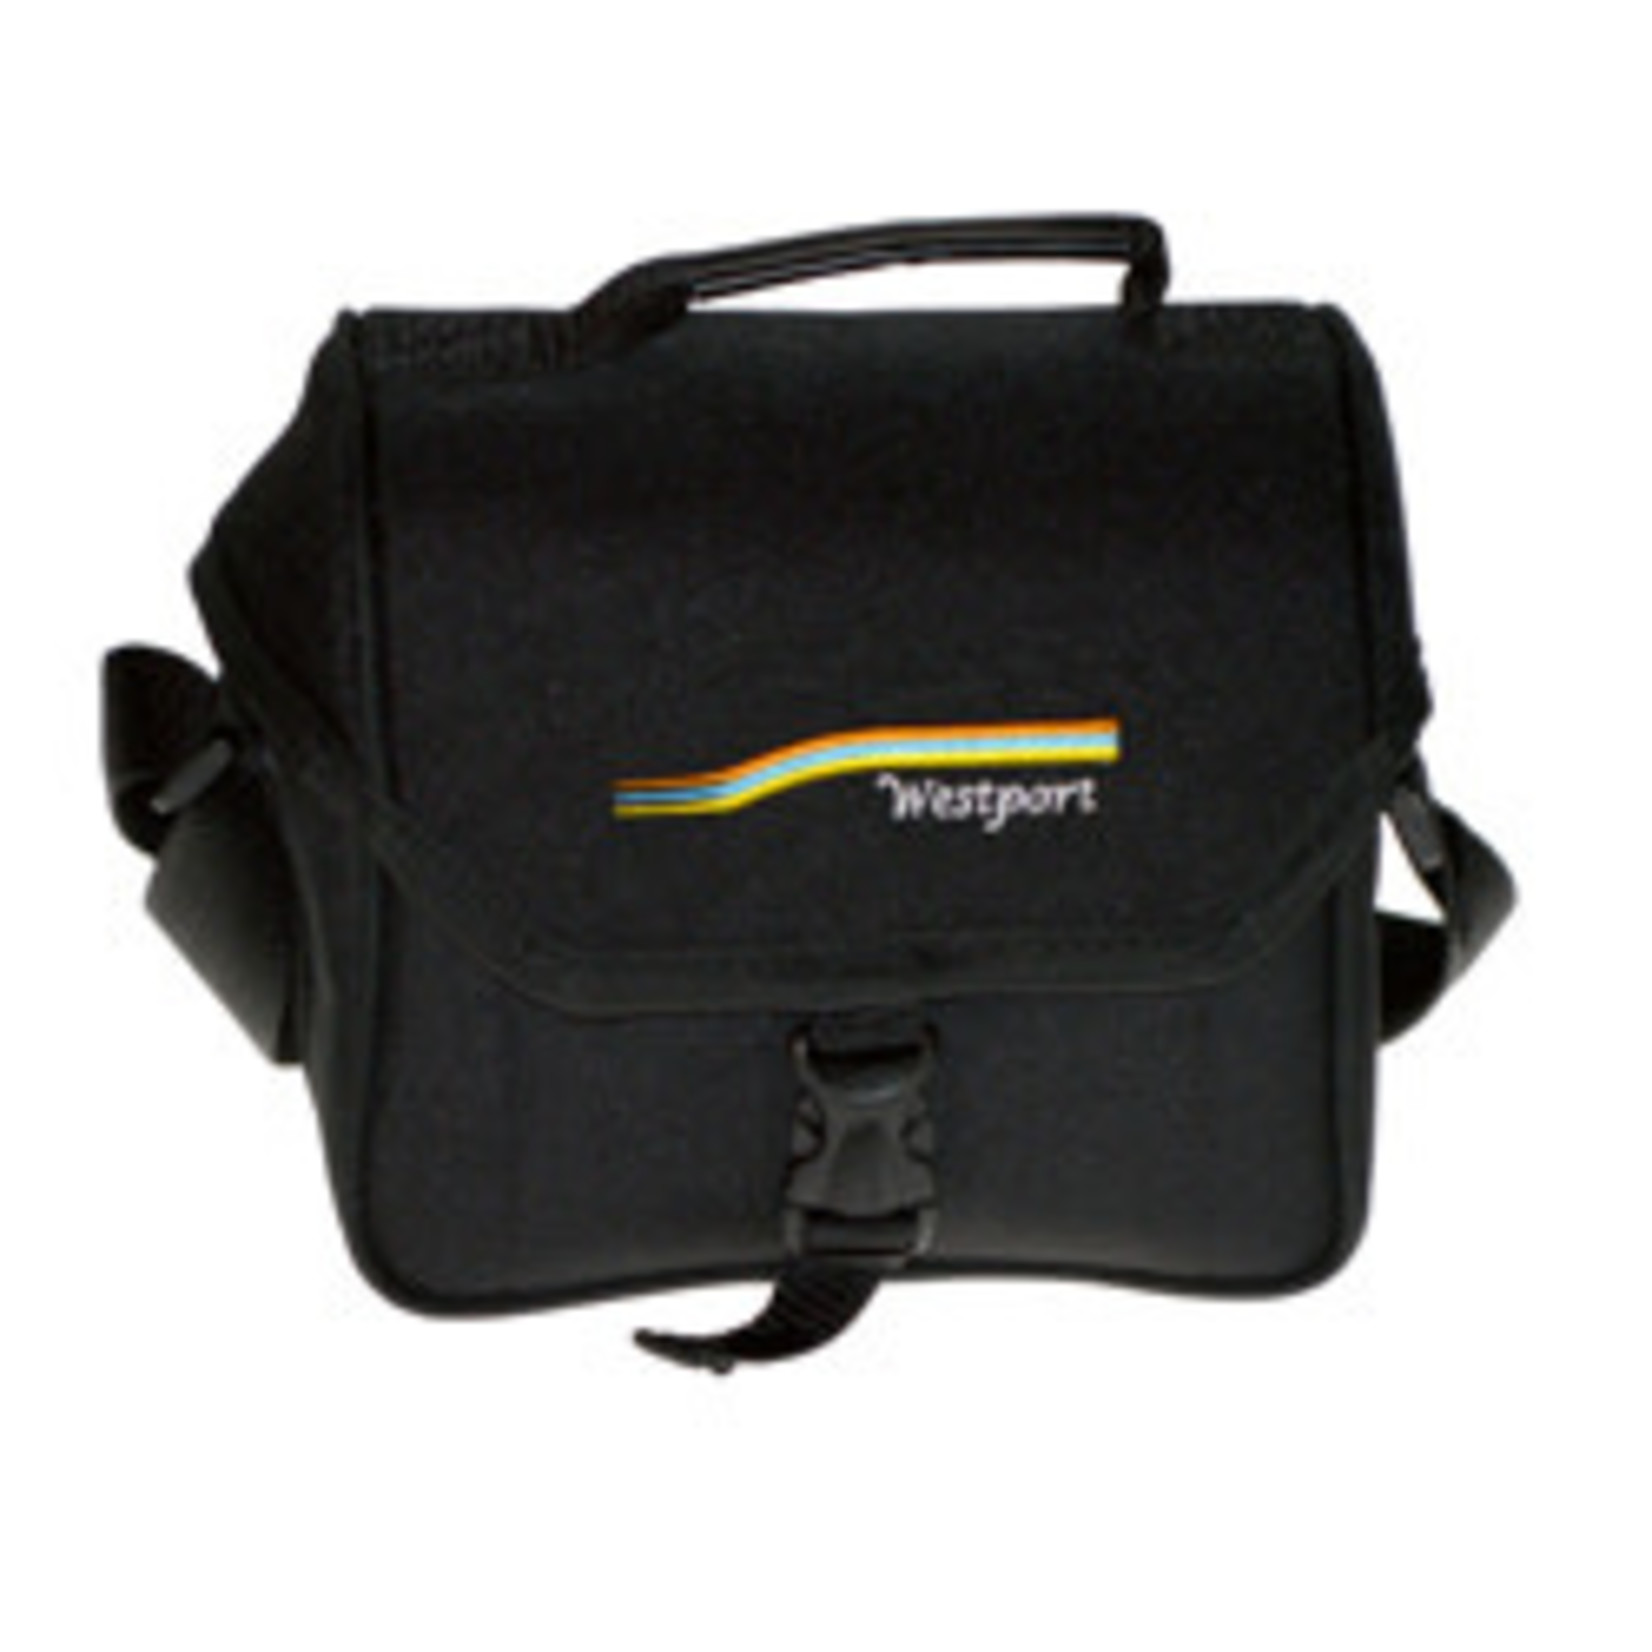 ProMaster Westport Mirrorless/Compact Camera Case